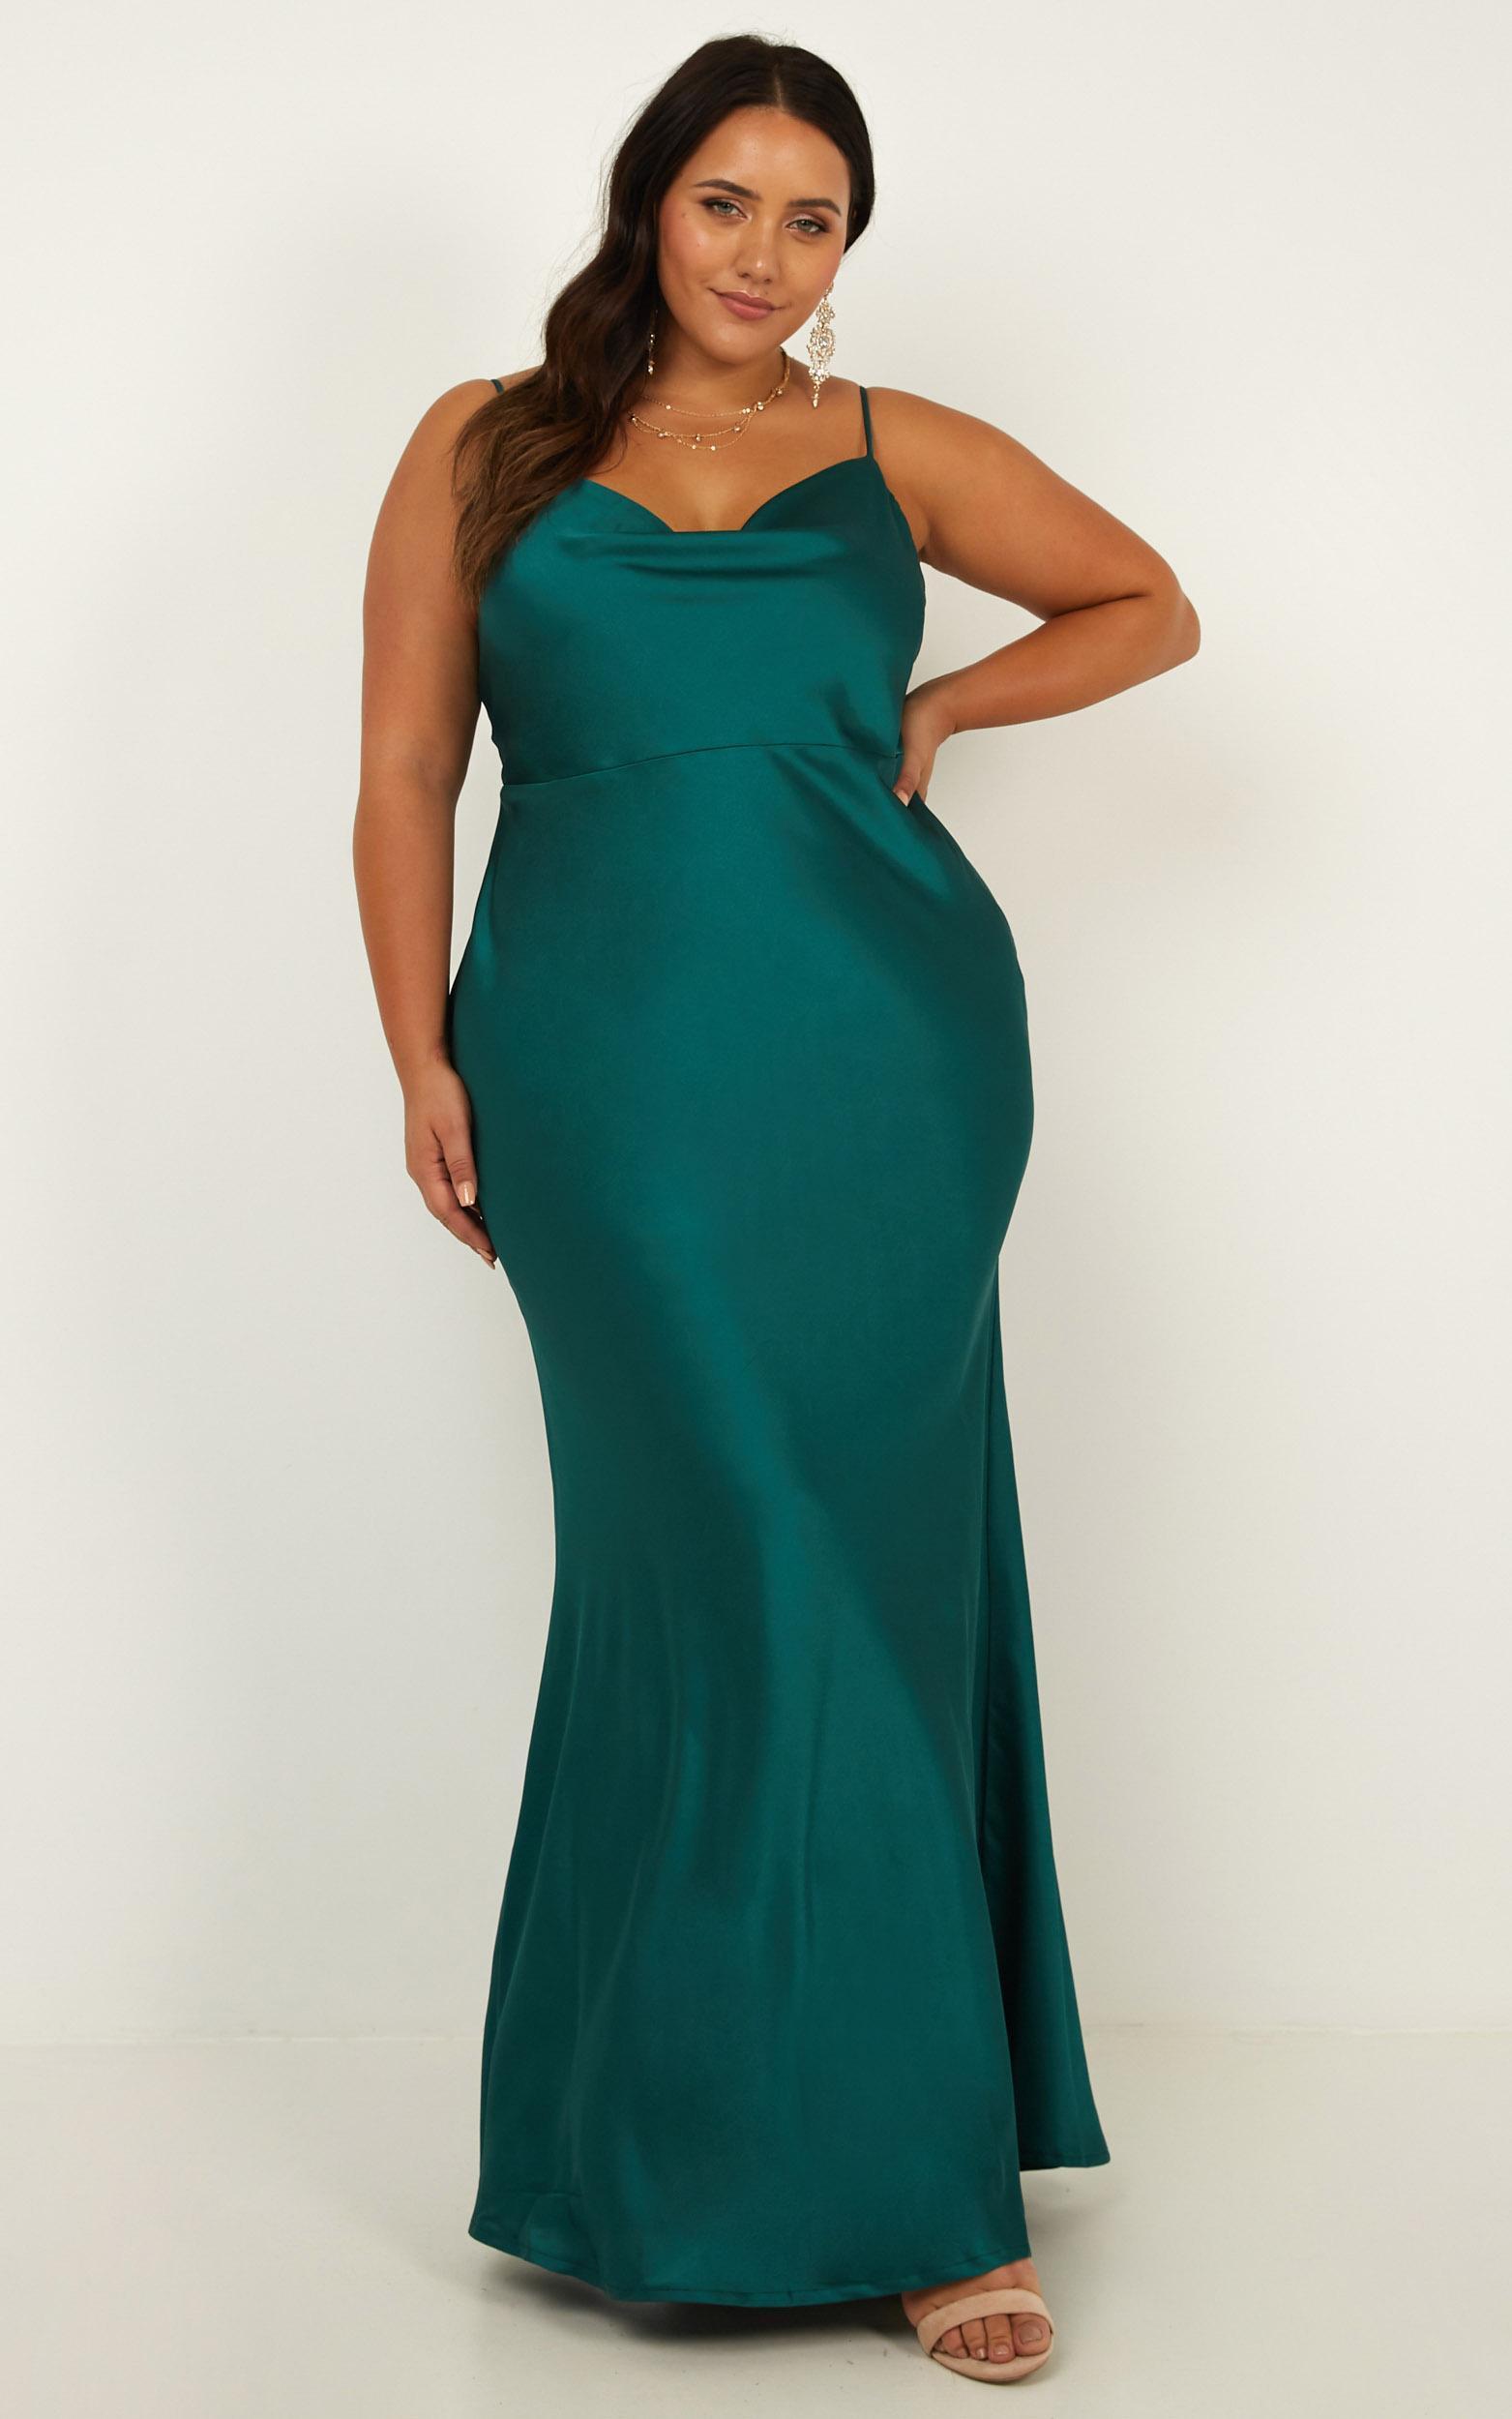 Run Deep Dress in emerald satin - 20 (XXXXL), Green, hi-res image number null